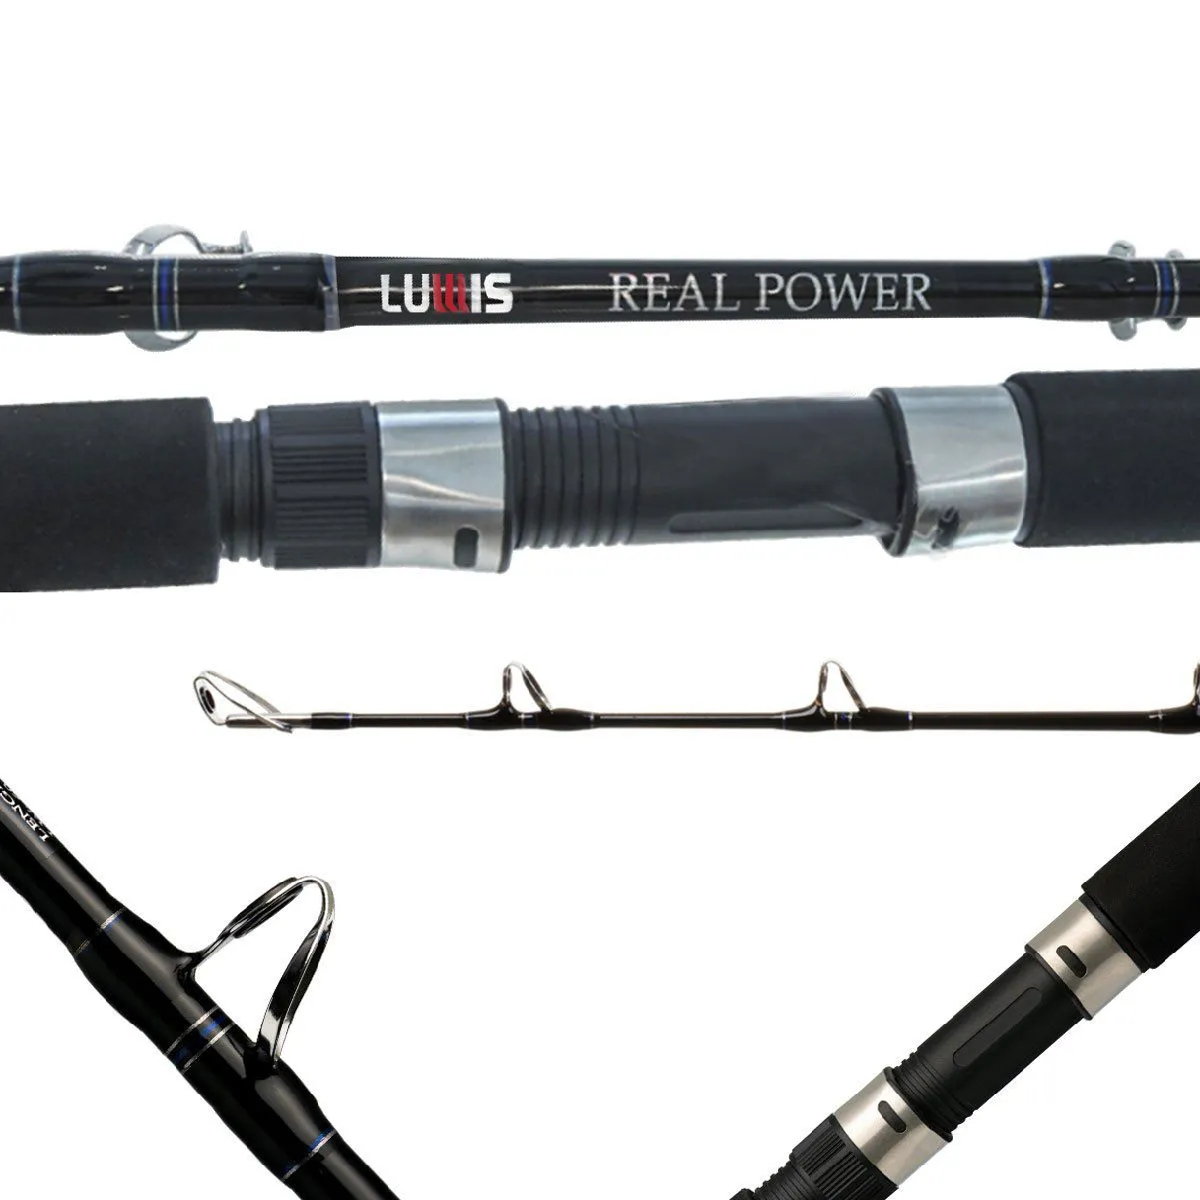 Vara Lumis Real Power 1,80m 80-160lb Inteiriça